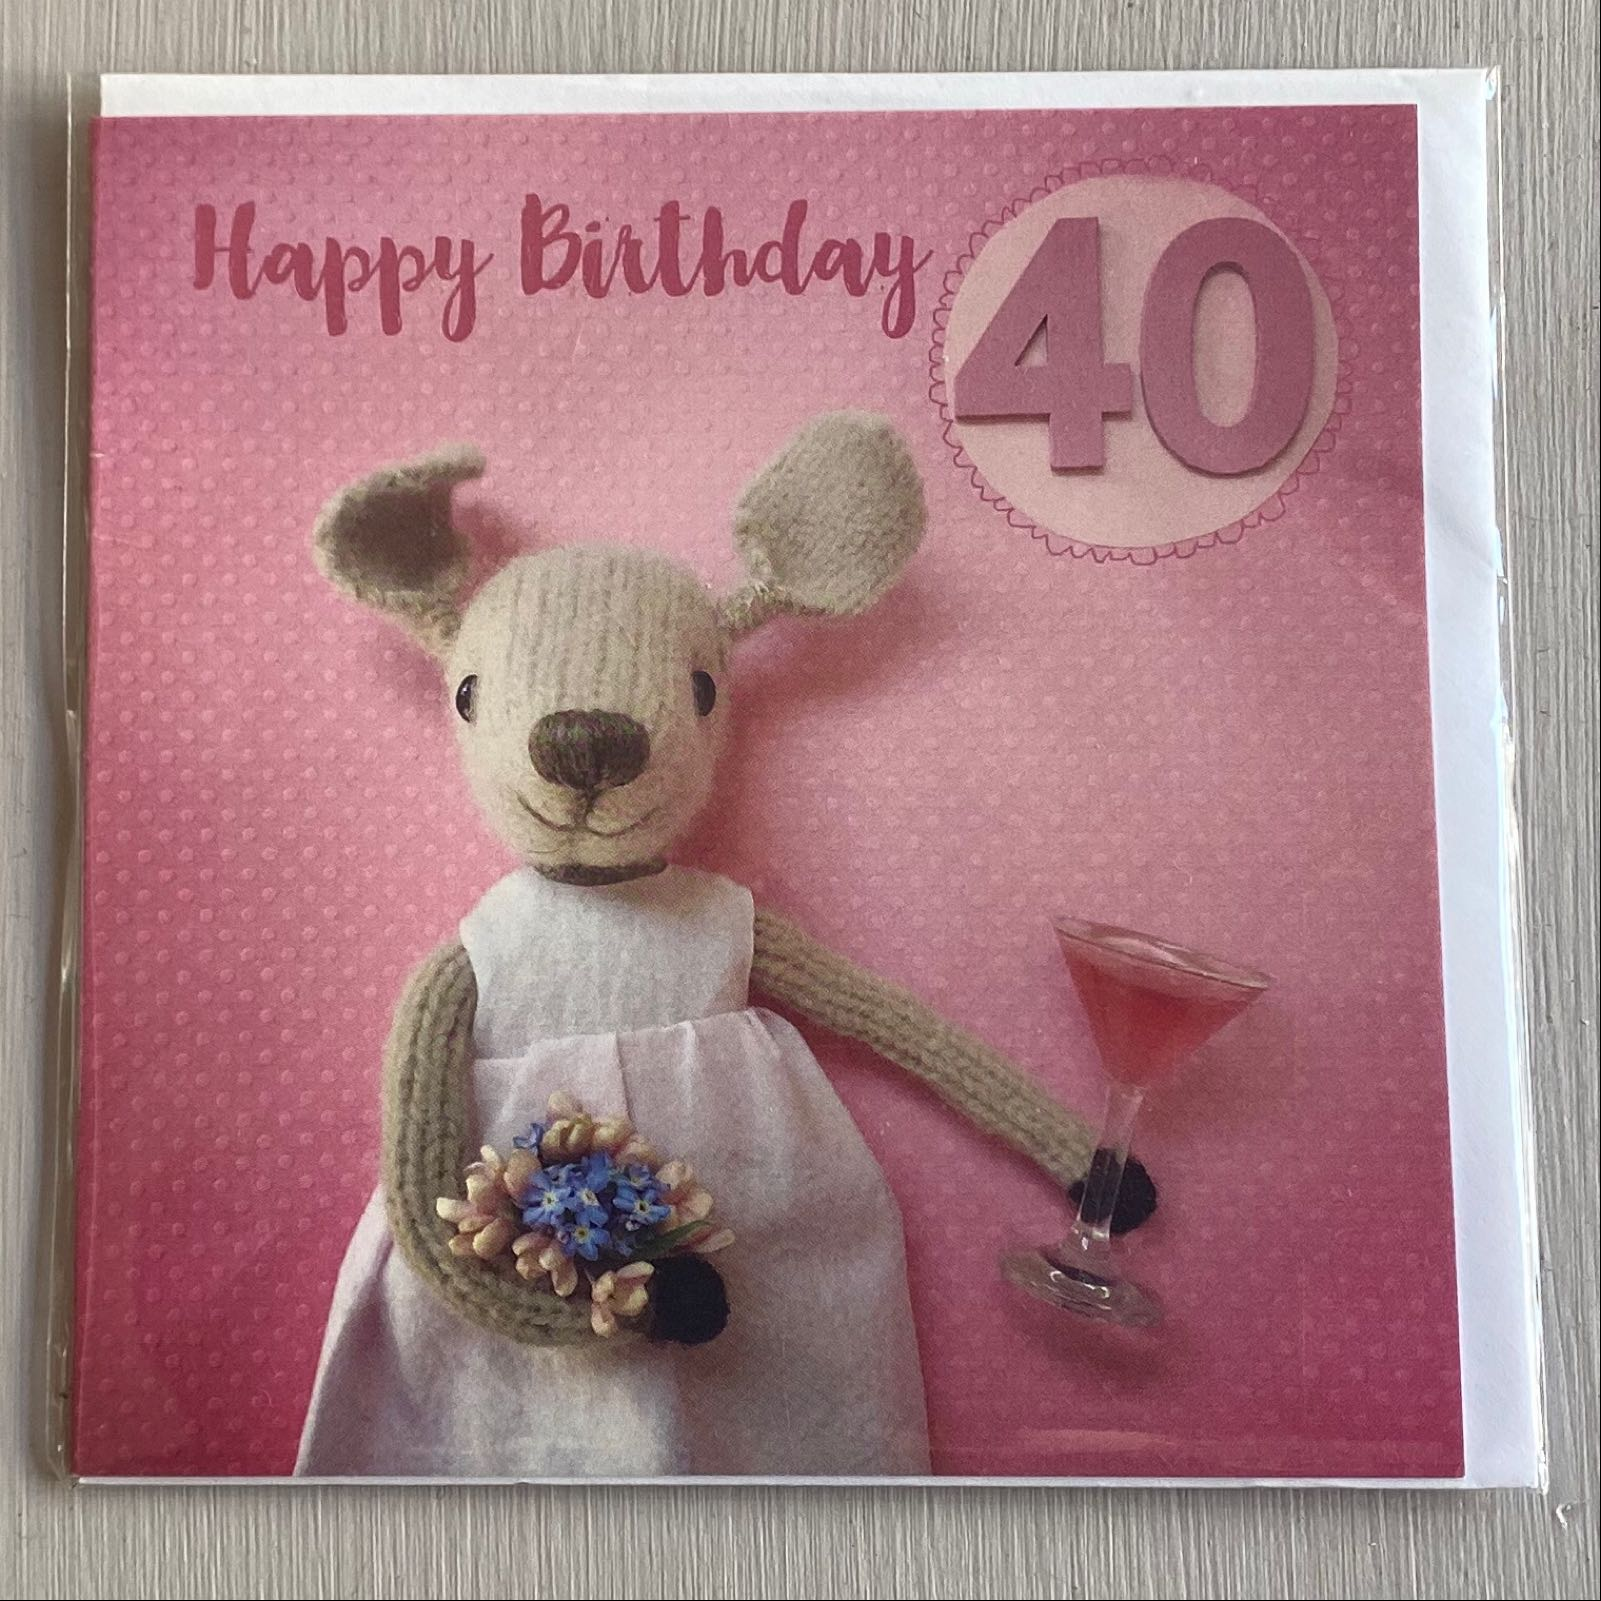 '40th Birthday' Pippi & Me Card